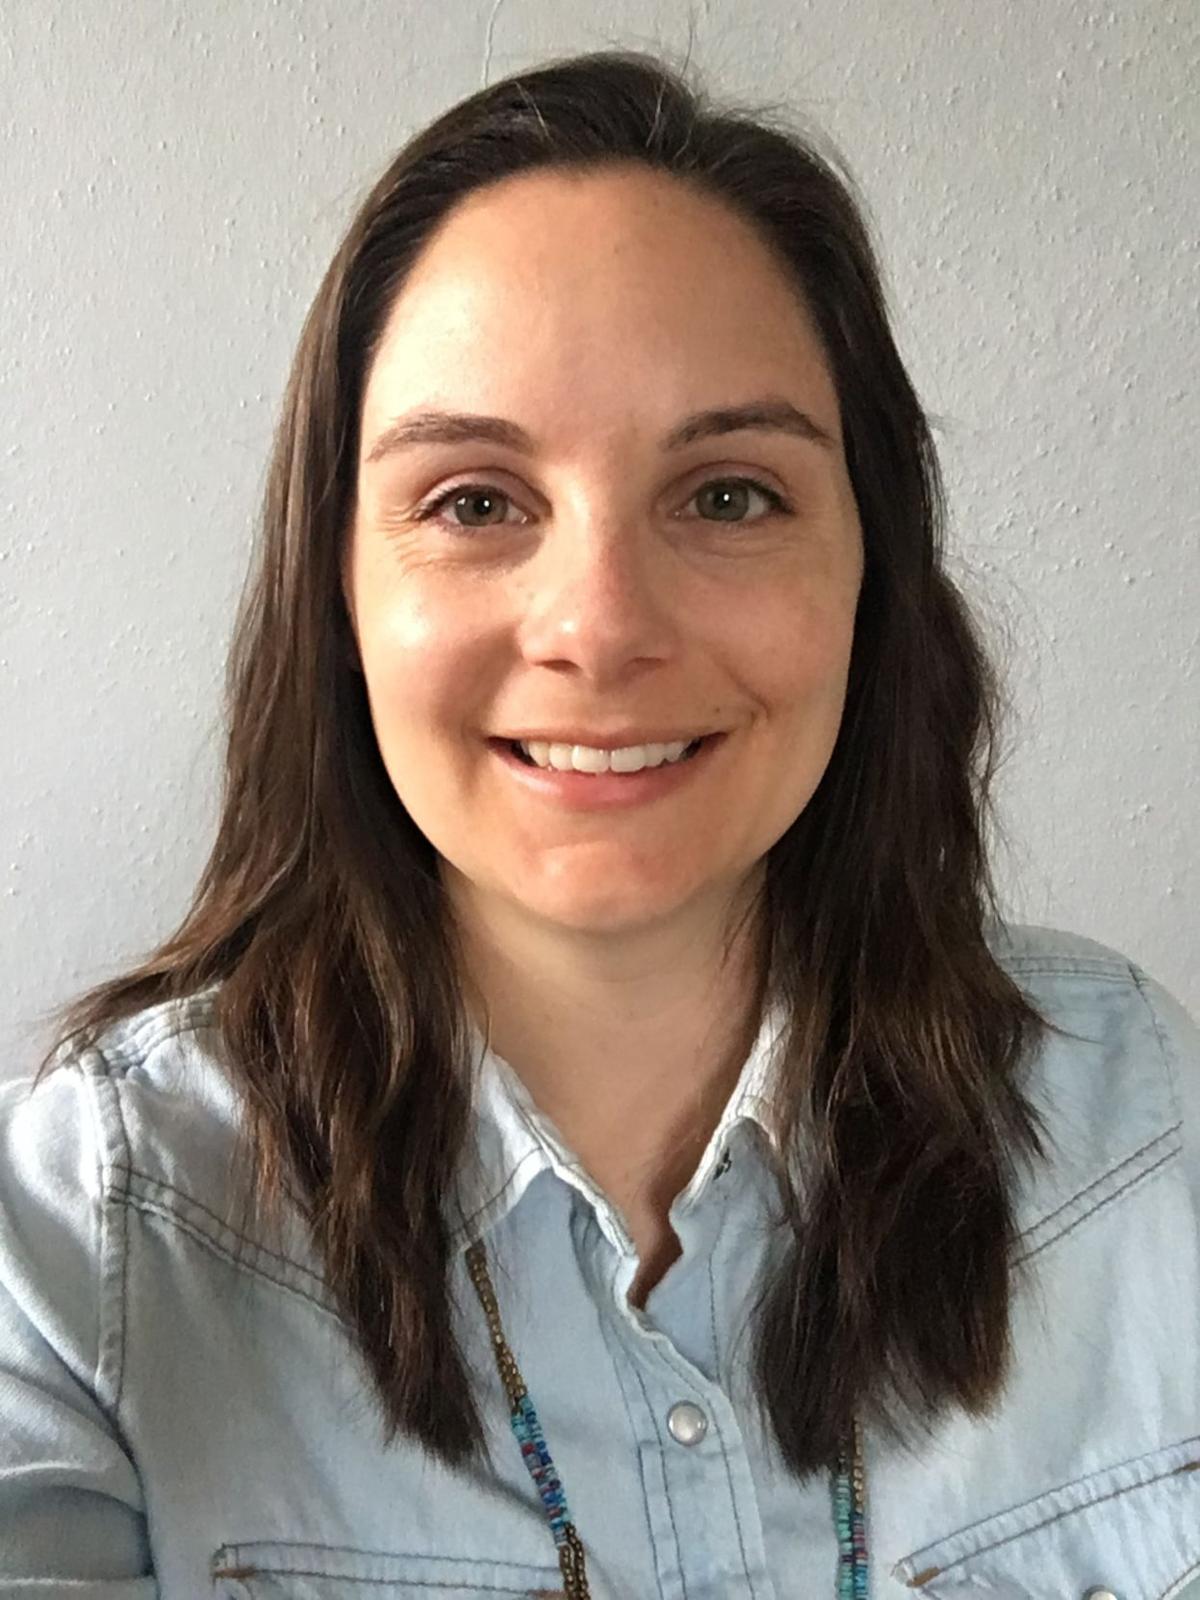 Melanie Wachholder.JPG